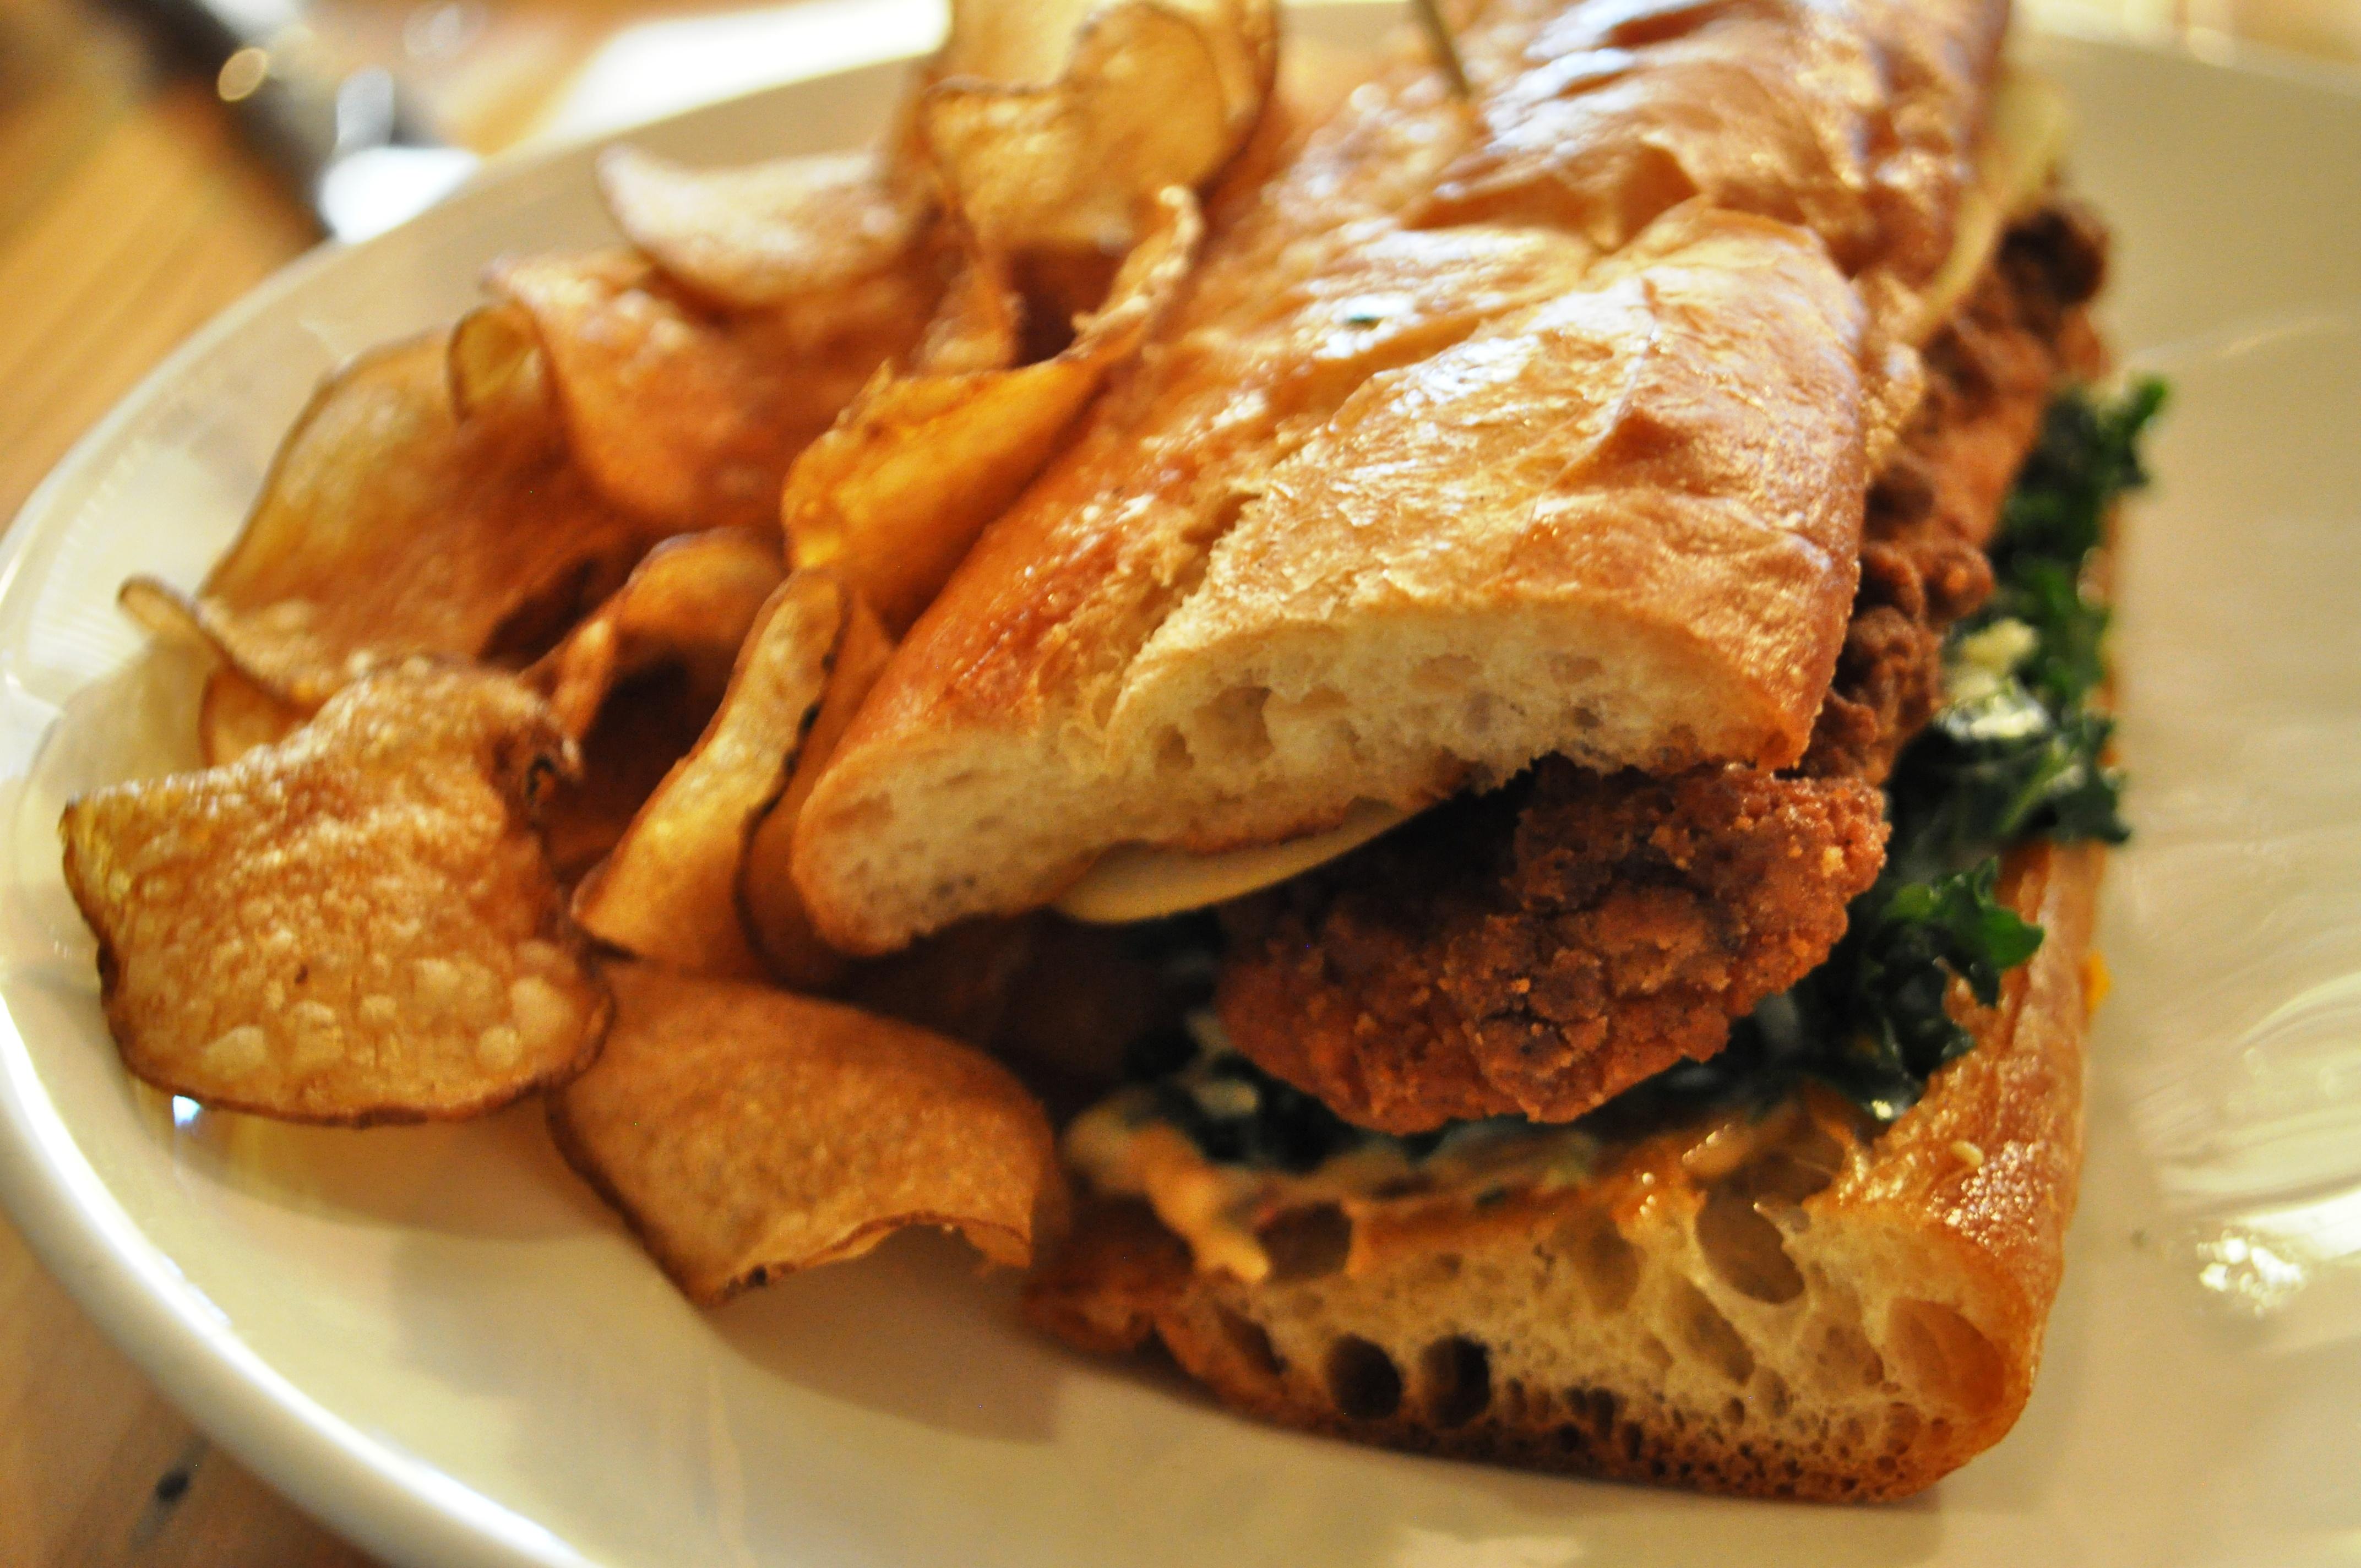 Deep-Fried Catfish Sandwich, Local Roots Restaurant, Roanoke, VA, April 2014 #OldSchoolVA #LoveVA